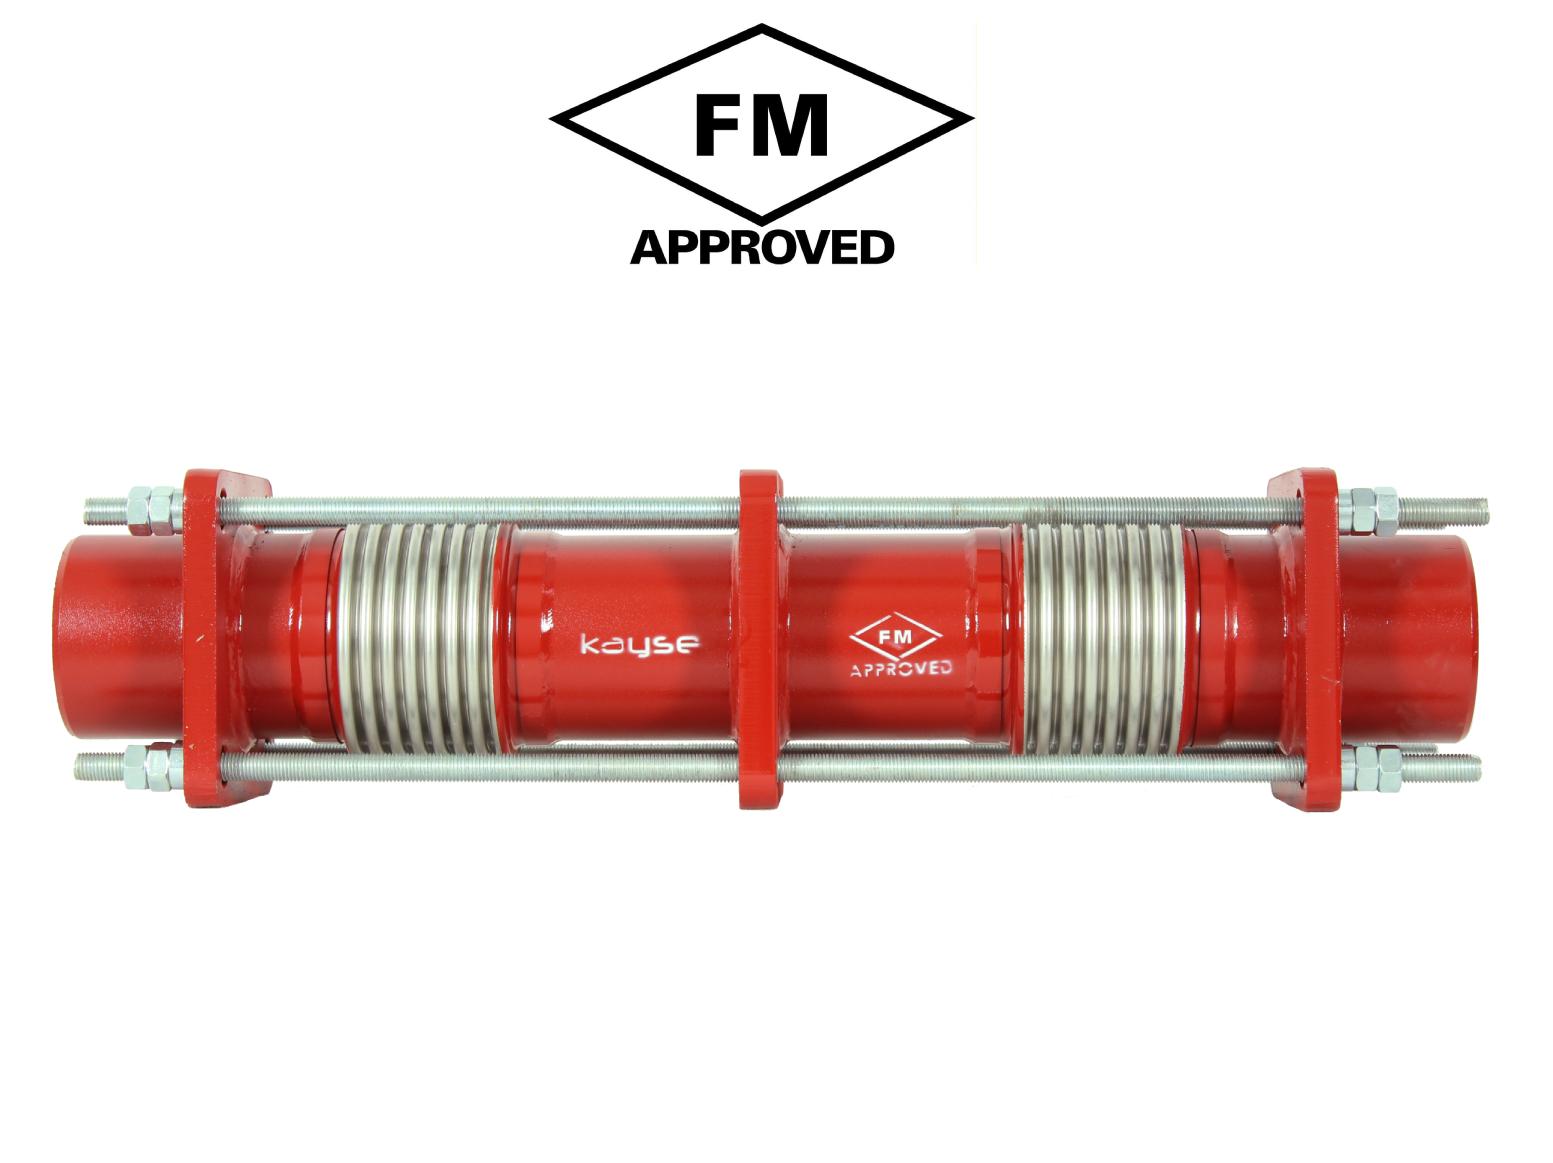 FM Onaylı Limit Rotlu Dilatasyon Kompansatörü - Kaynak Boyunlu